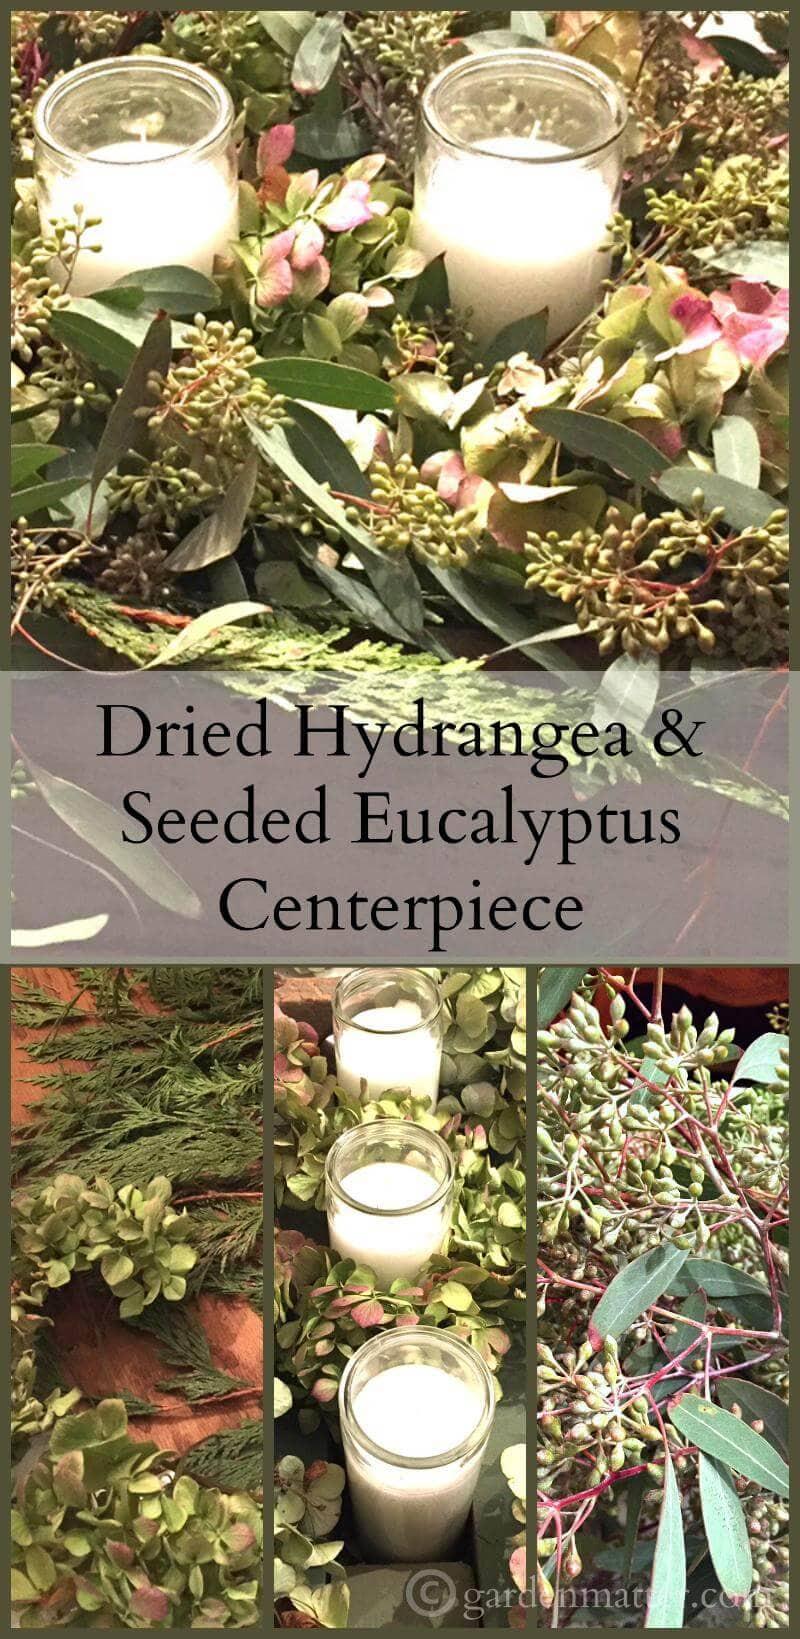 Hydrangea-Seeded-Eucalyptus-Centerpiece-gardenmatter.com_